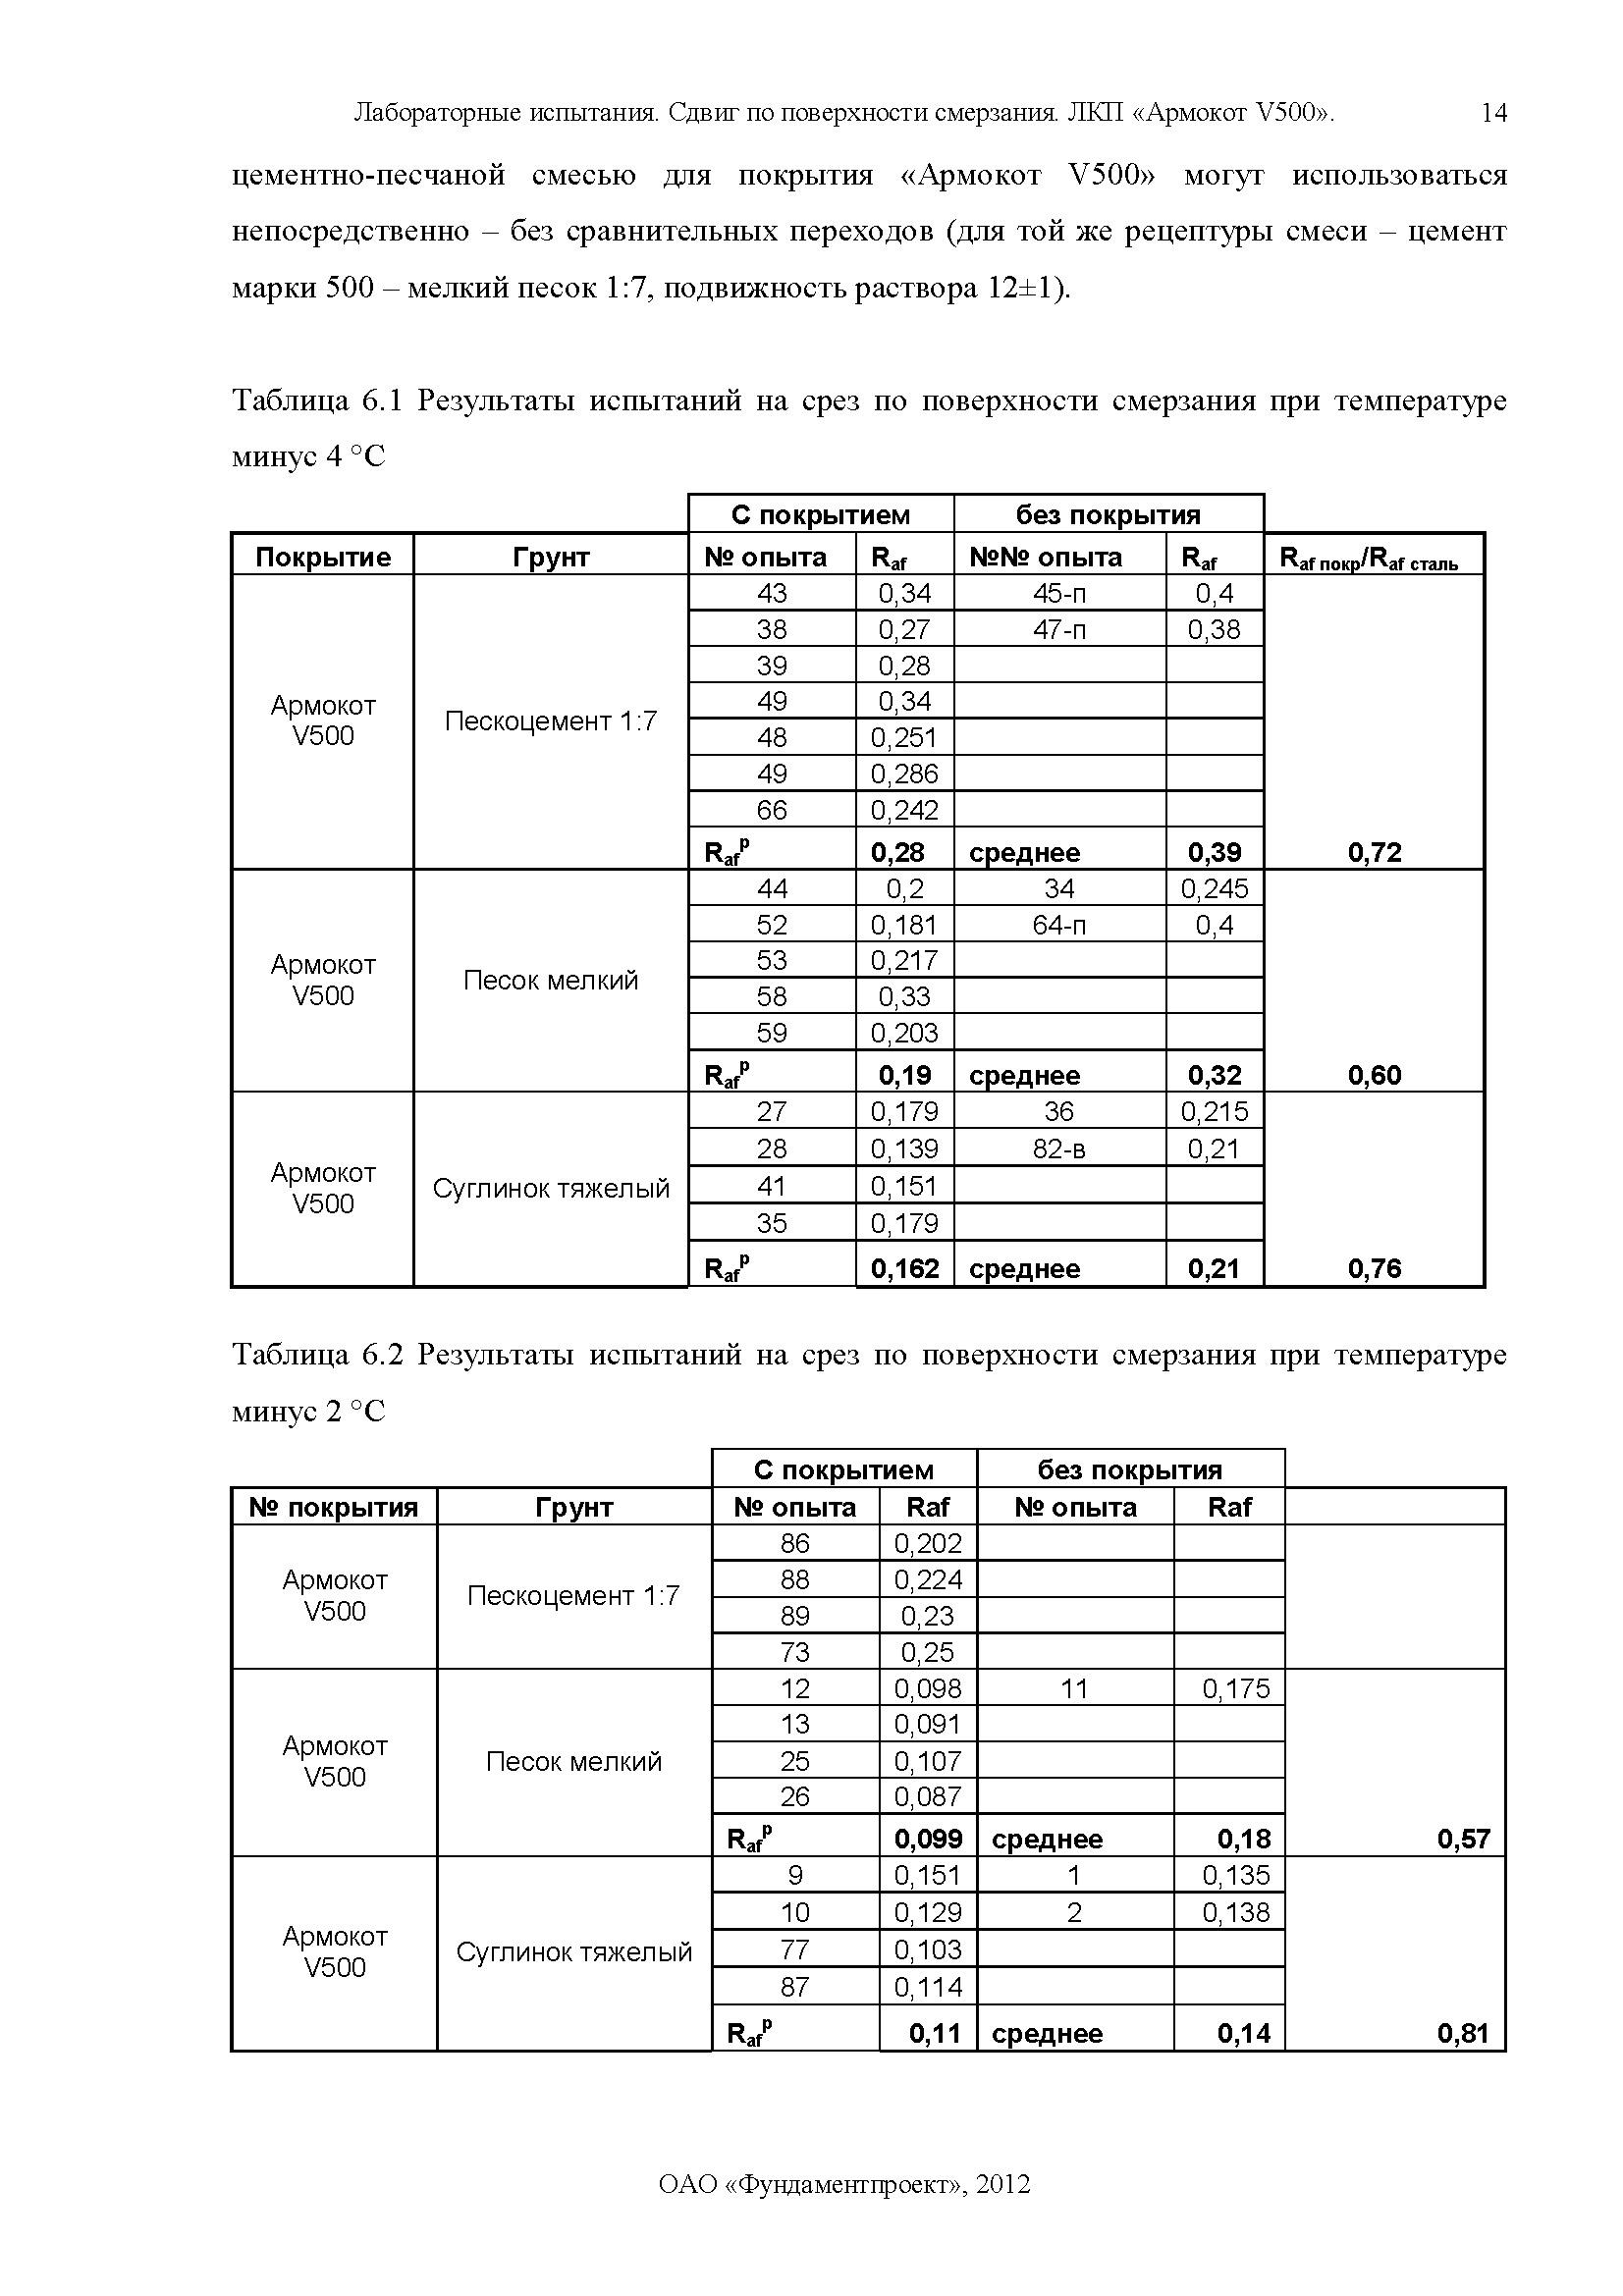 Отчет по сваям Армокот V500 Фундаментпроект_Страница_14